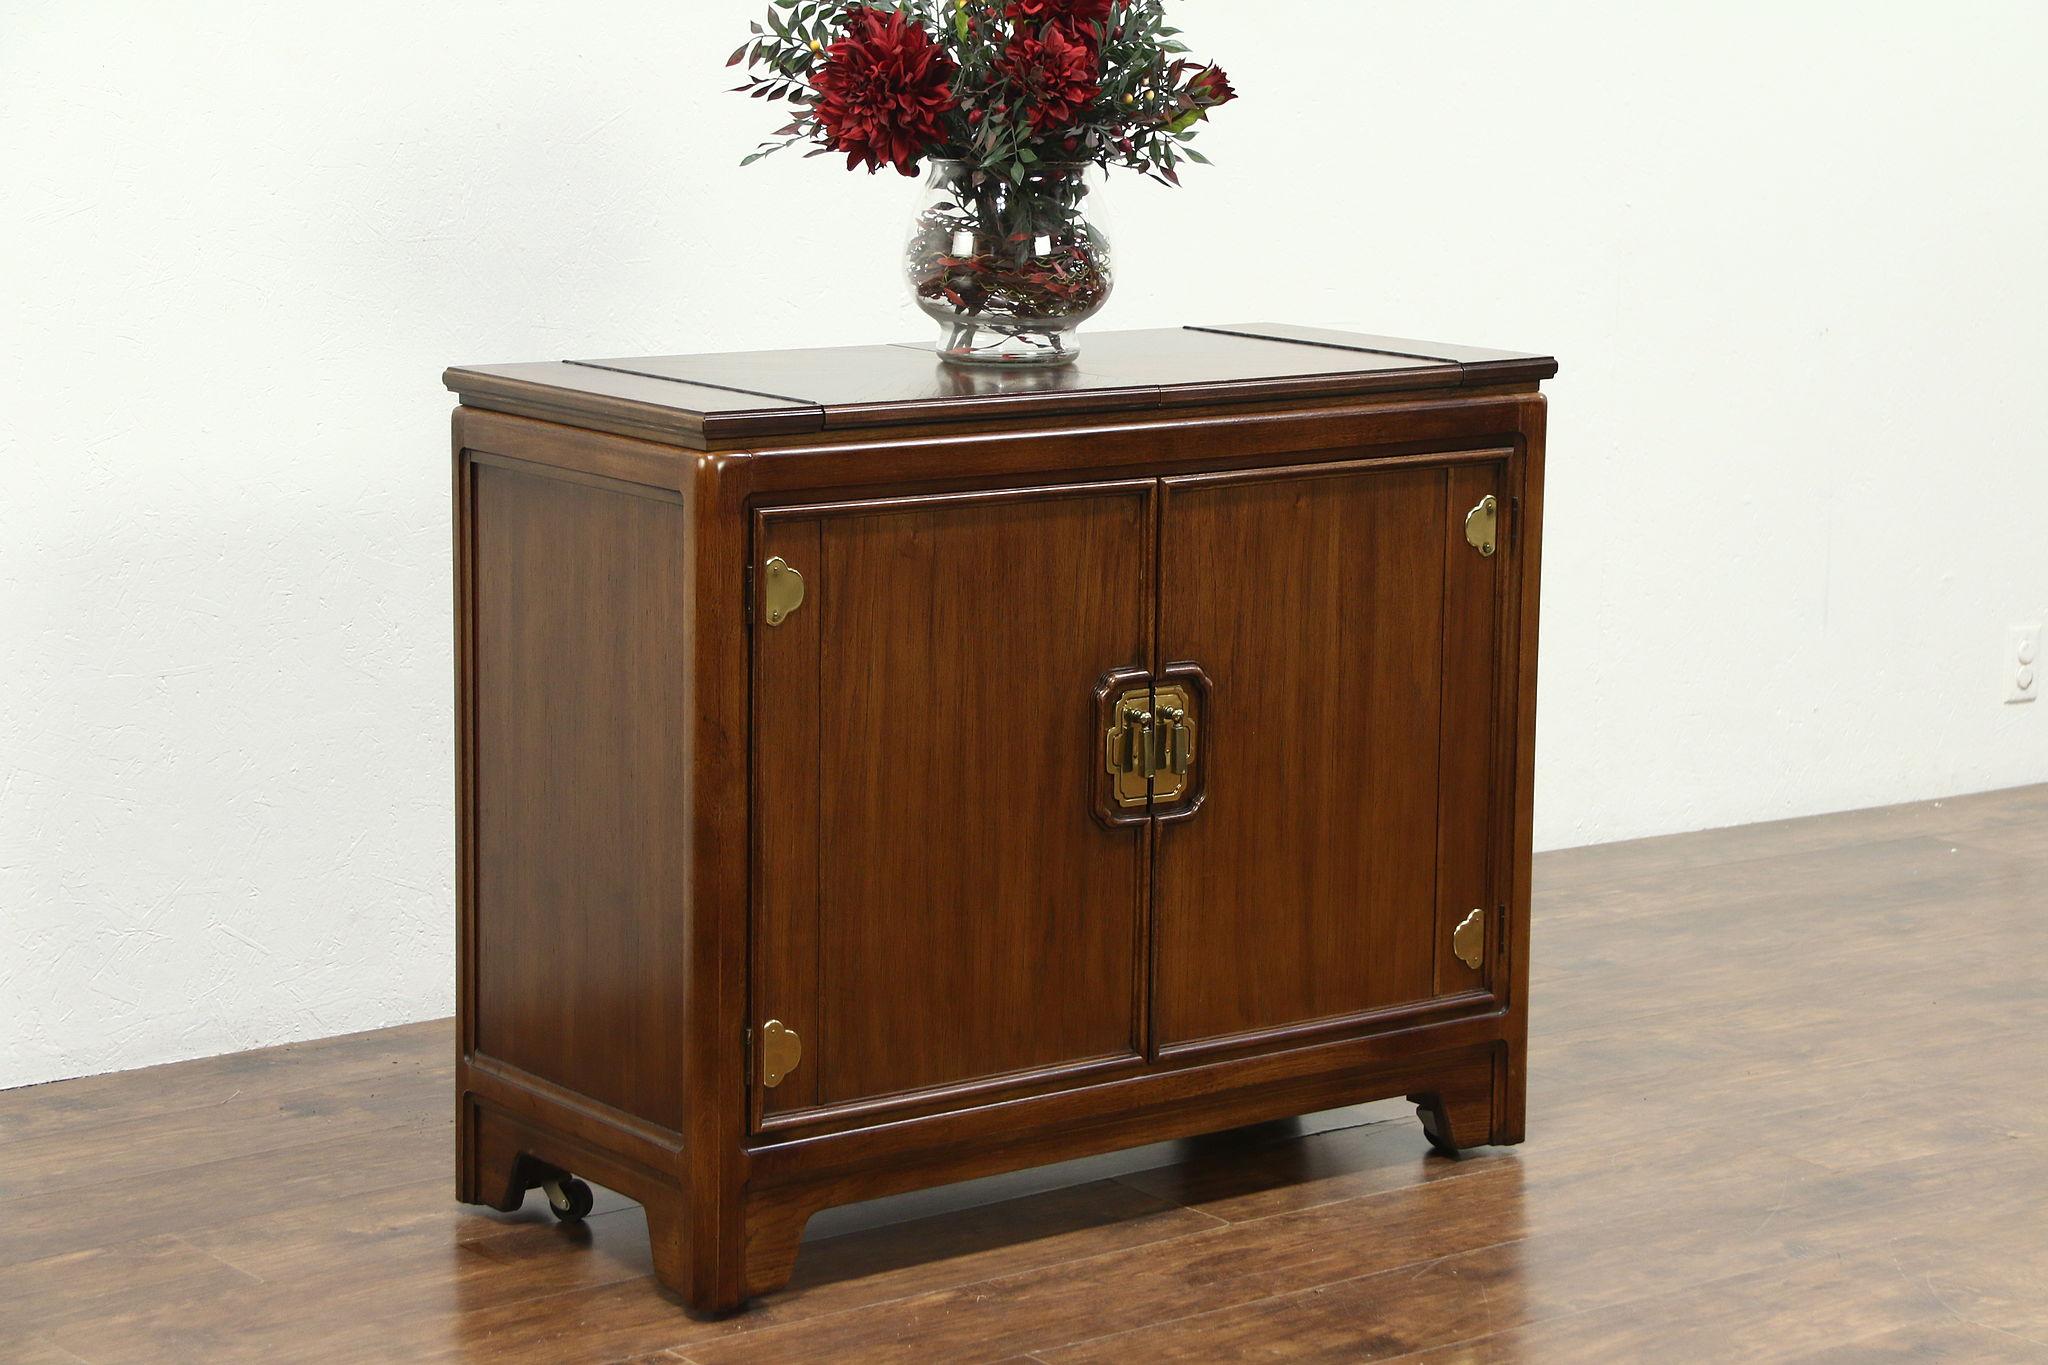 Sold Bar Cabinet Or Server Vintage Fruitwood Flip Open Top Signed Thomasville Harp Gallery Antiques Furniture